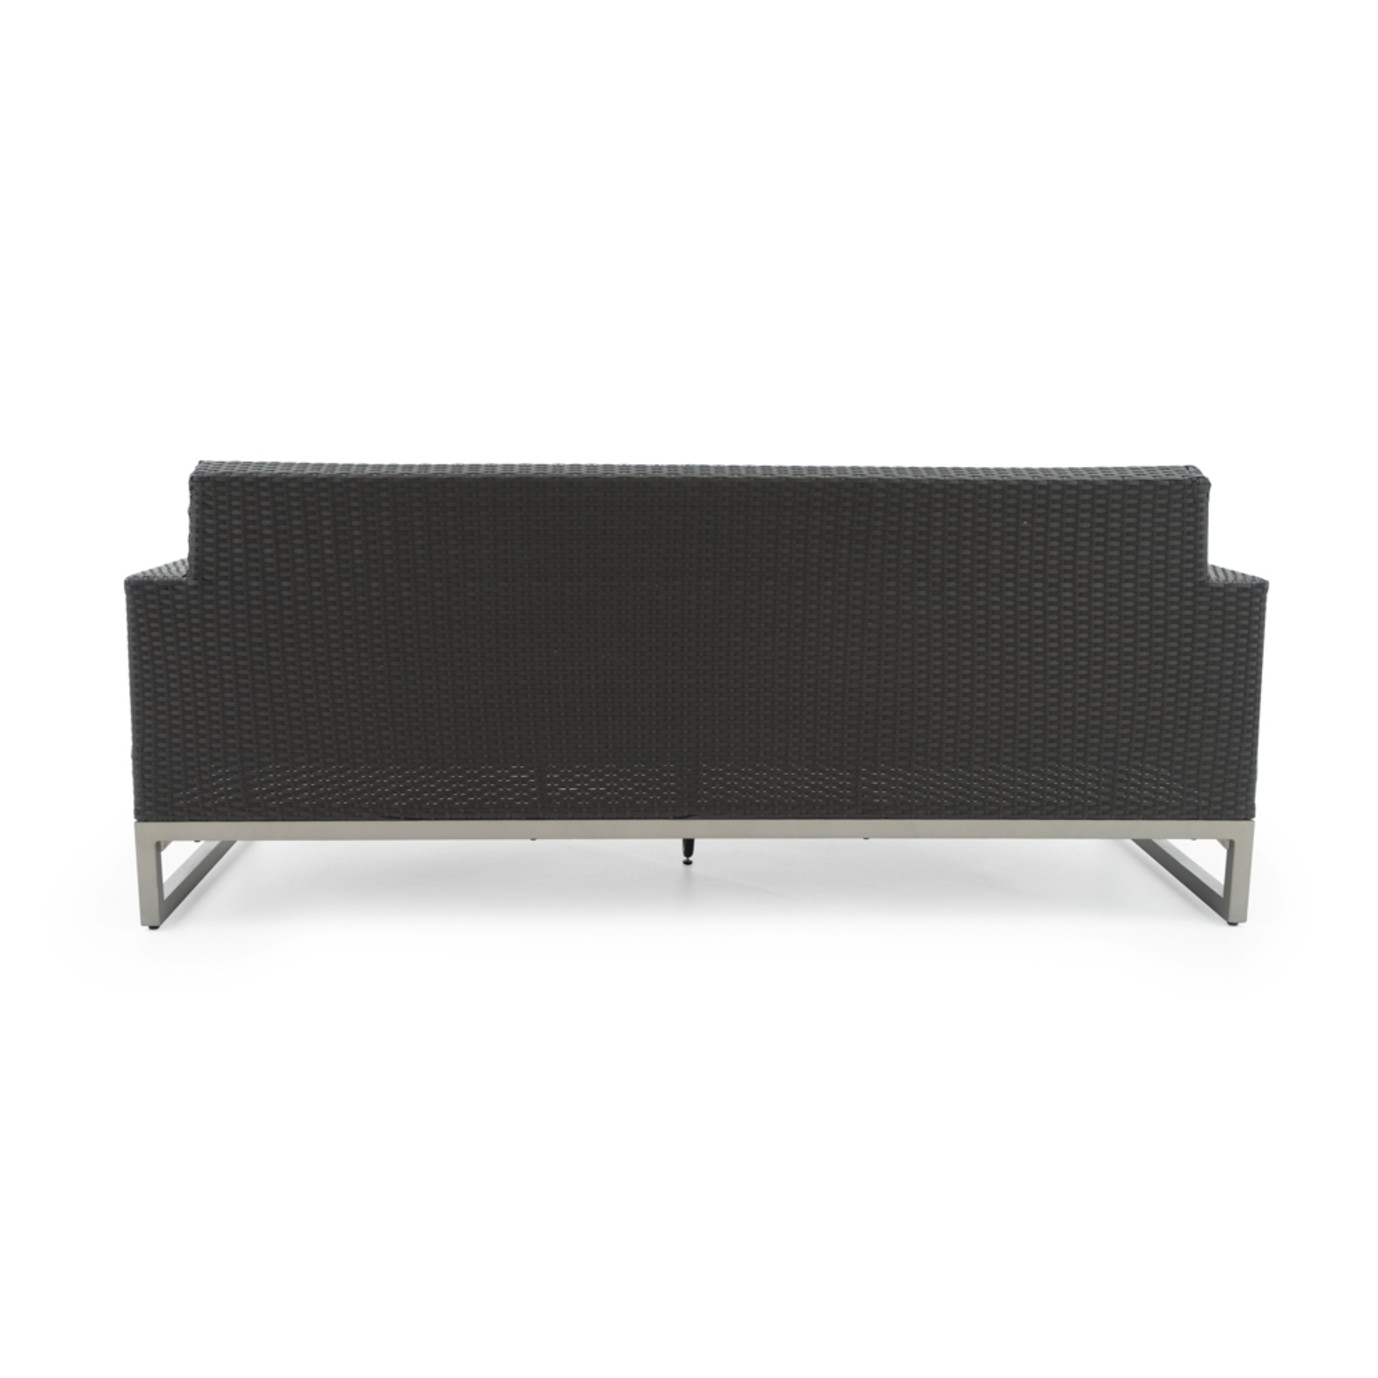 Milo™ Espresso 78in Sofa - Maxim Beige